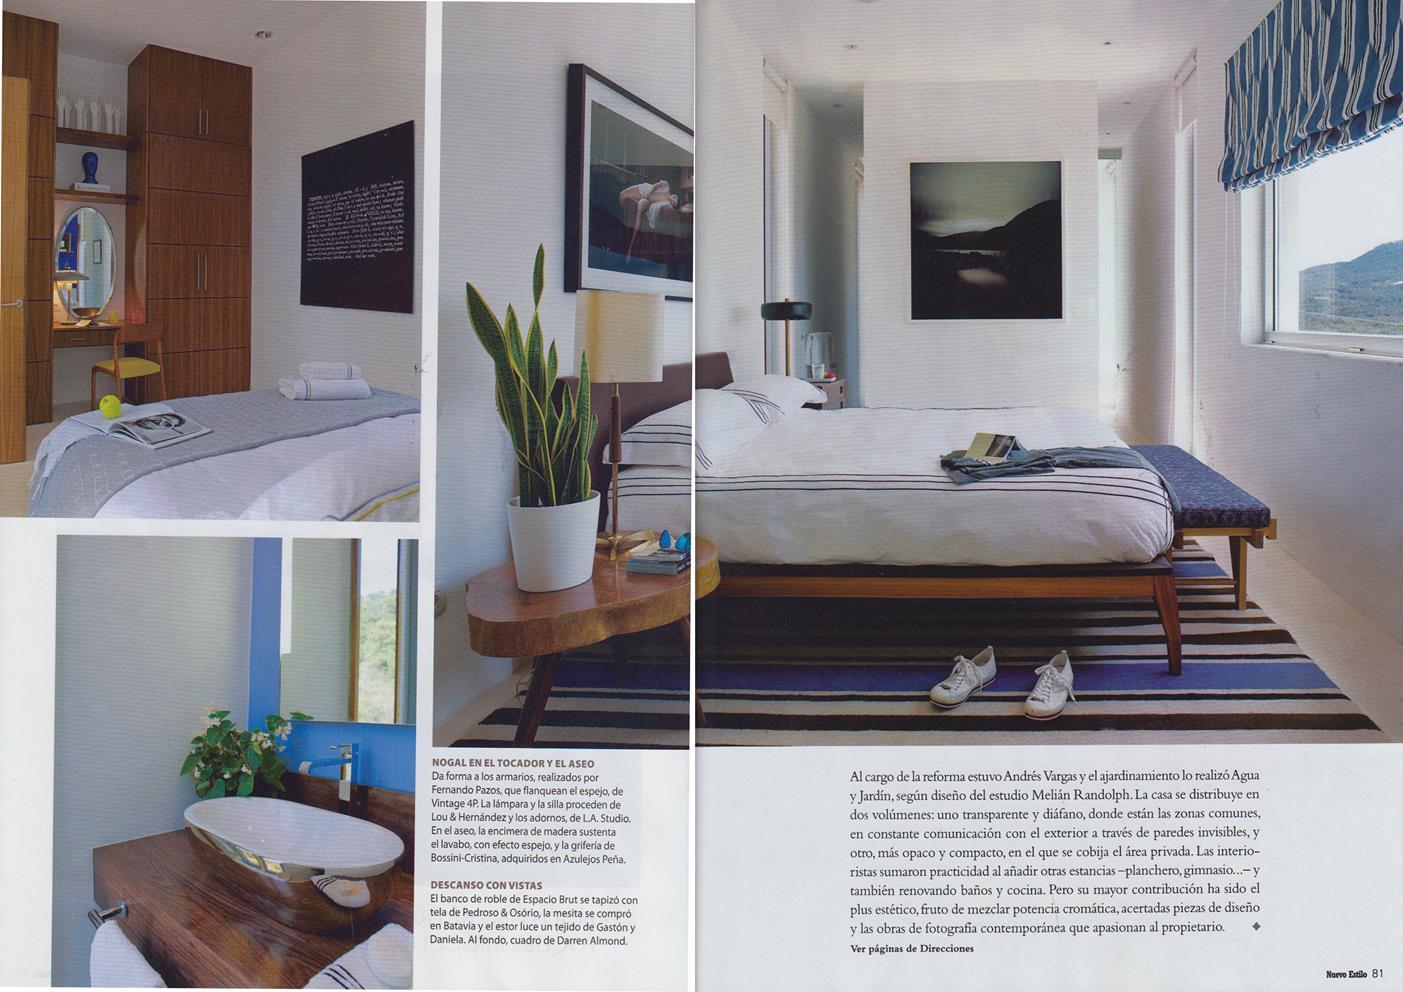 reportaje-nuevo_estilo-julio-2014-melian_randolph-ibiza-7